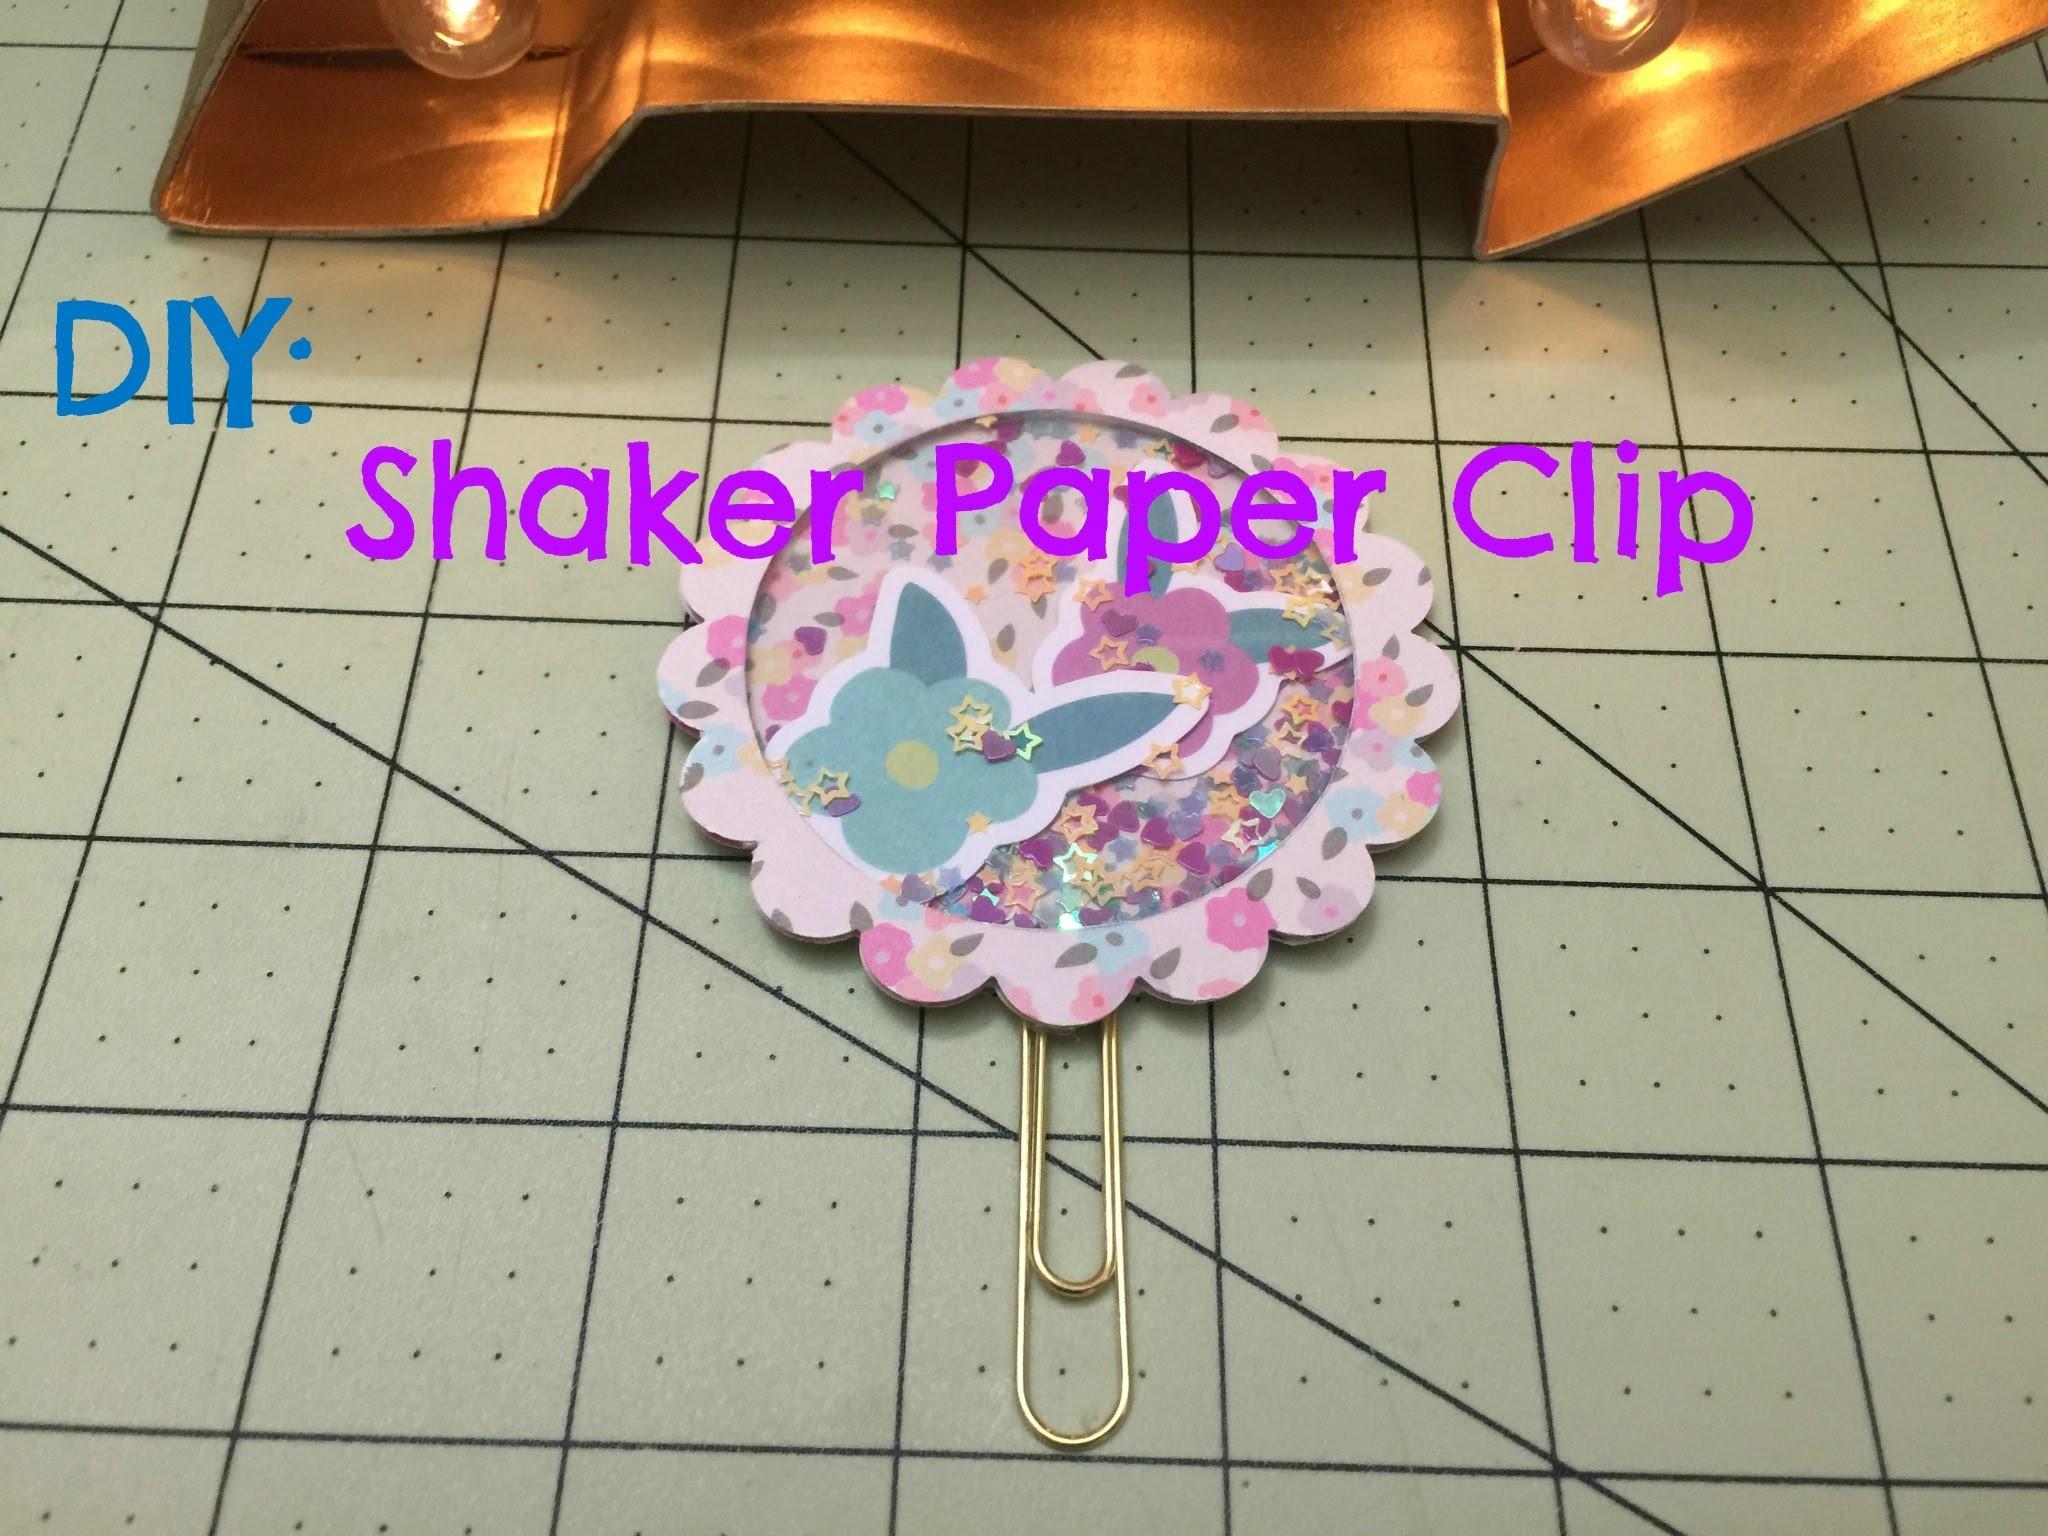 DIY: Shaker Paper Clip